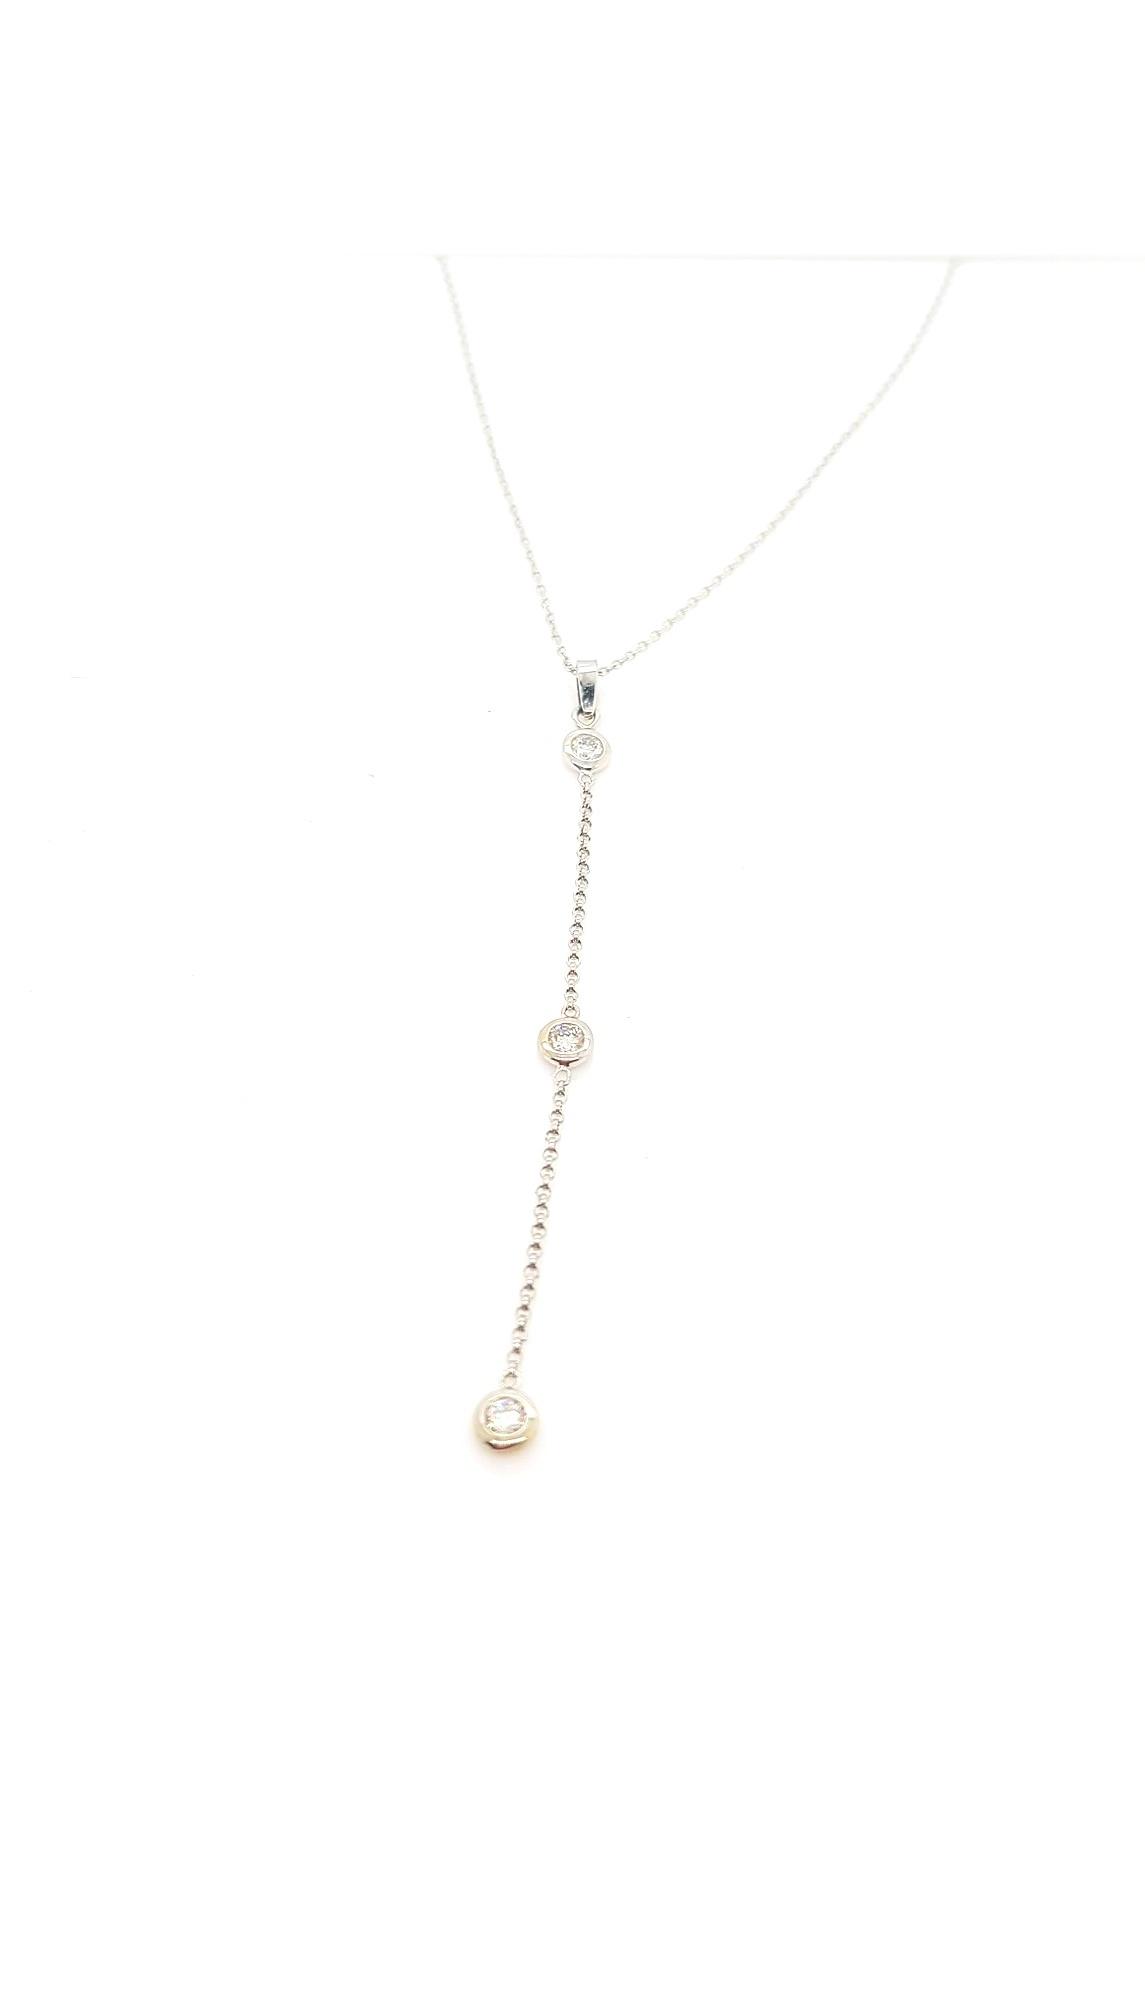 Pendant Enhancer for Station Necklace, 14kt white gold